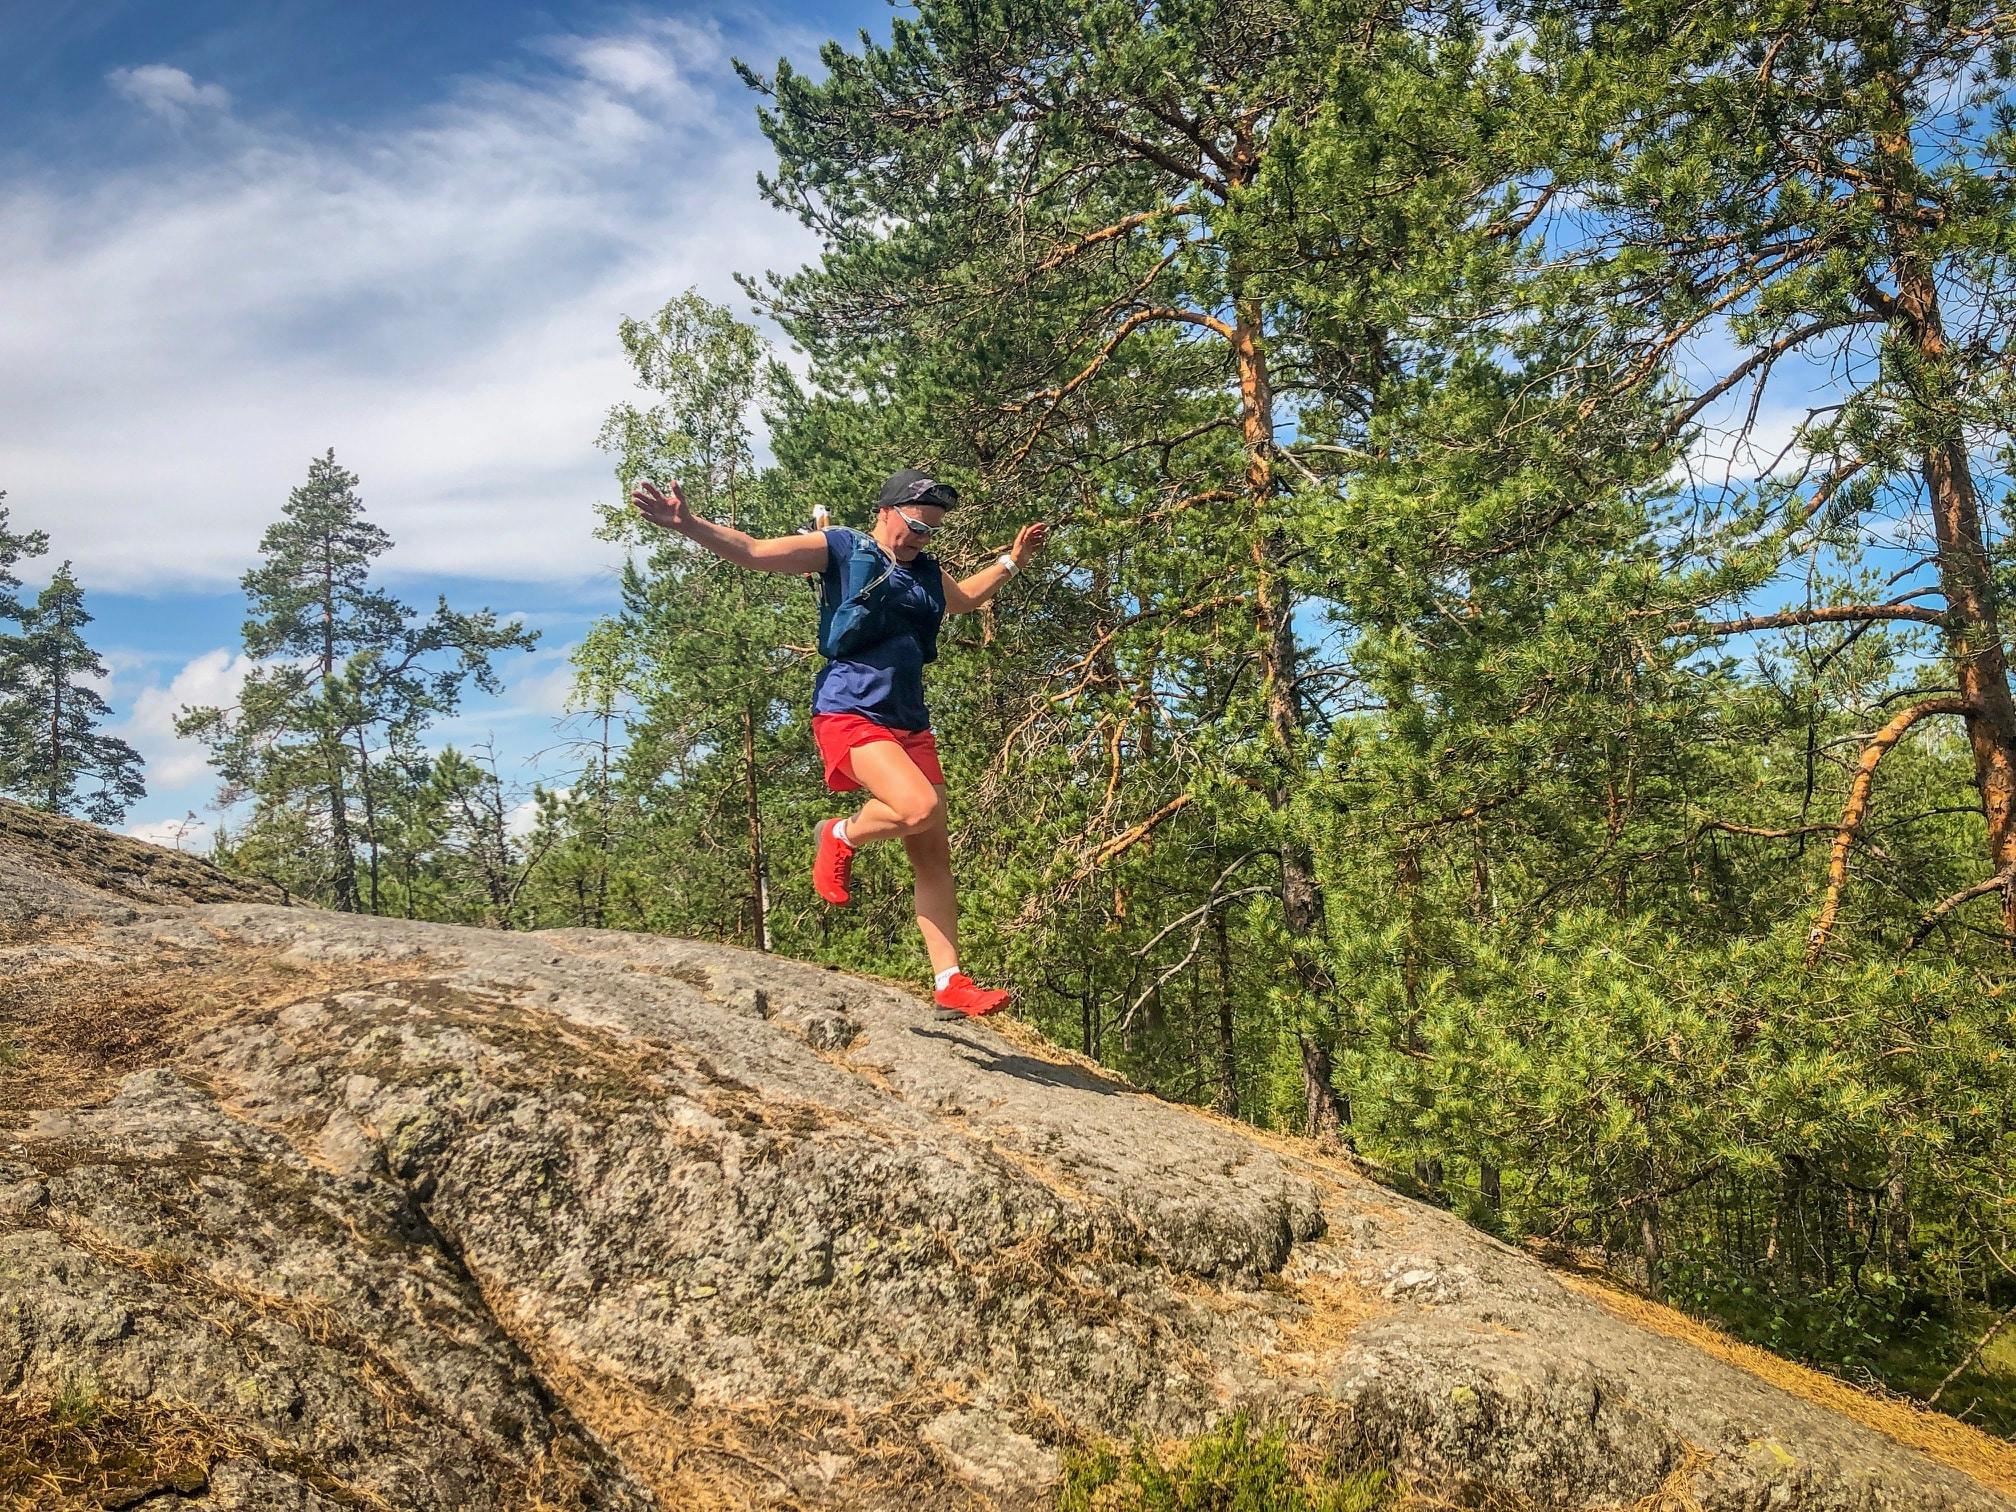 Lihaskuntotreeniä ja juoksua – monipuolisesti parempi